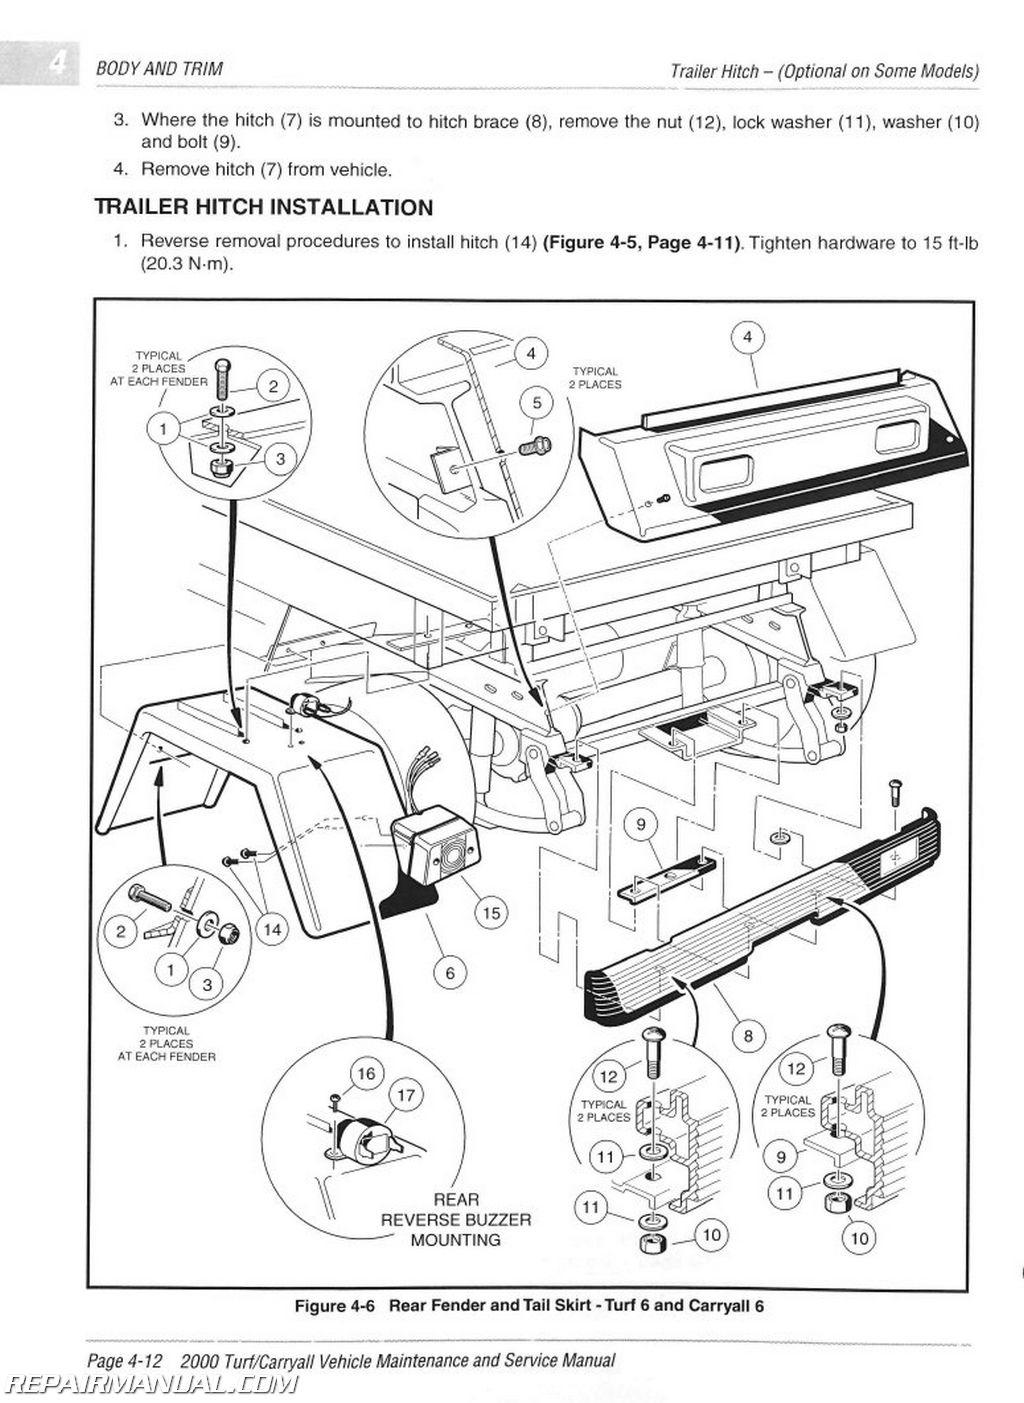 1991 Electric Club Car Wiring Diagram Schematic - Wiring Diagrams Hubs - Club Car Precedent Wiring Diagram